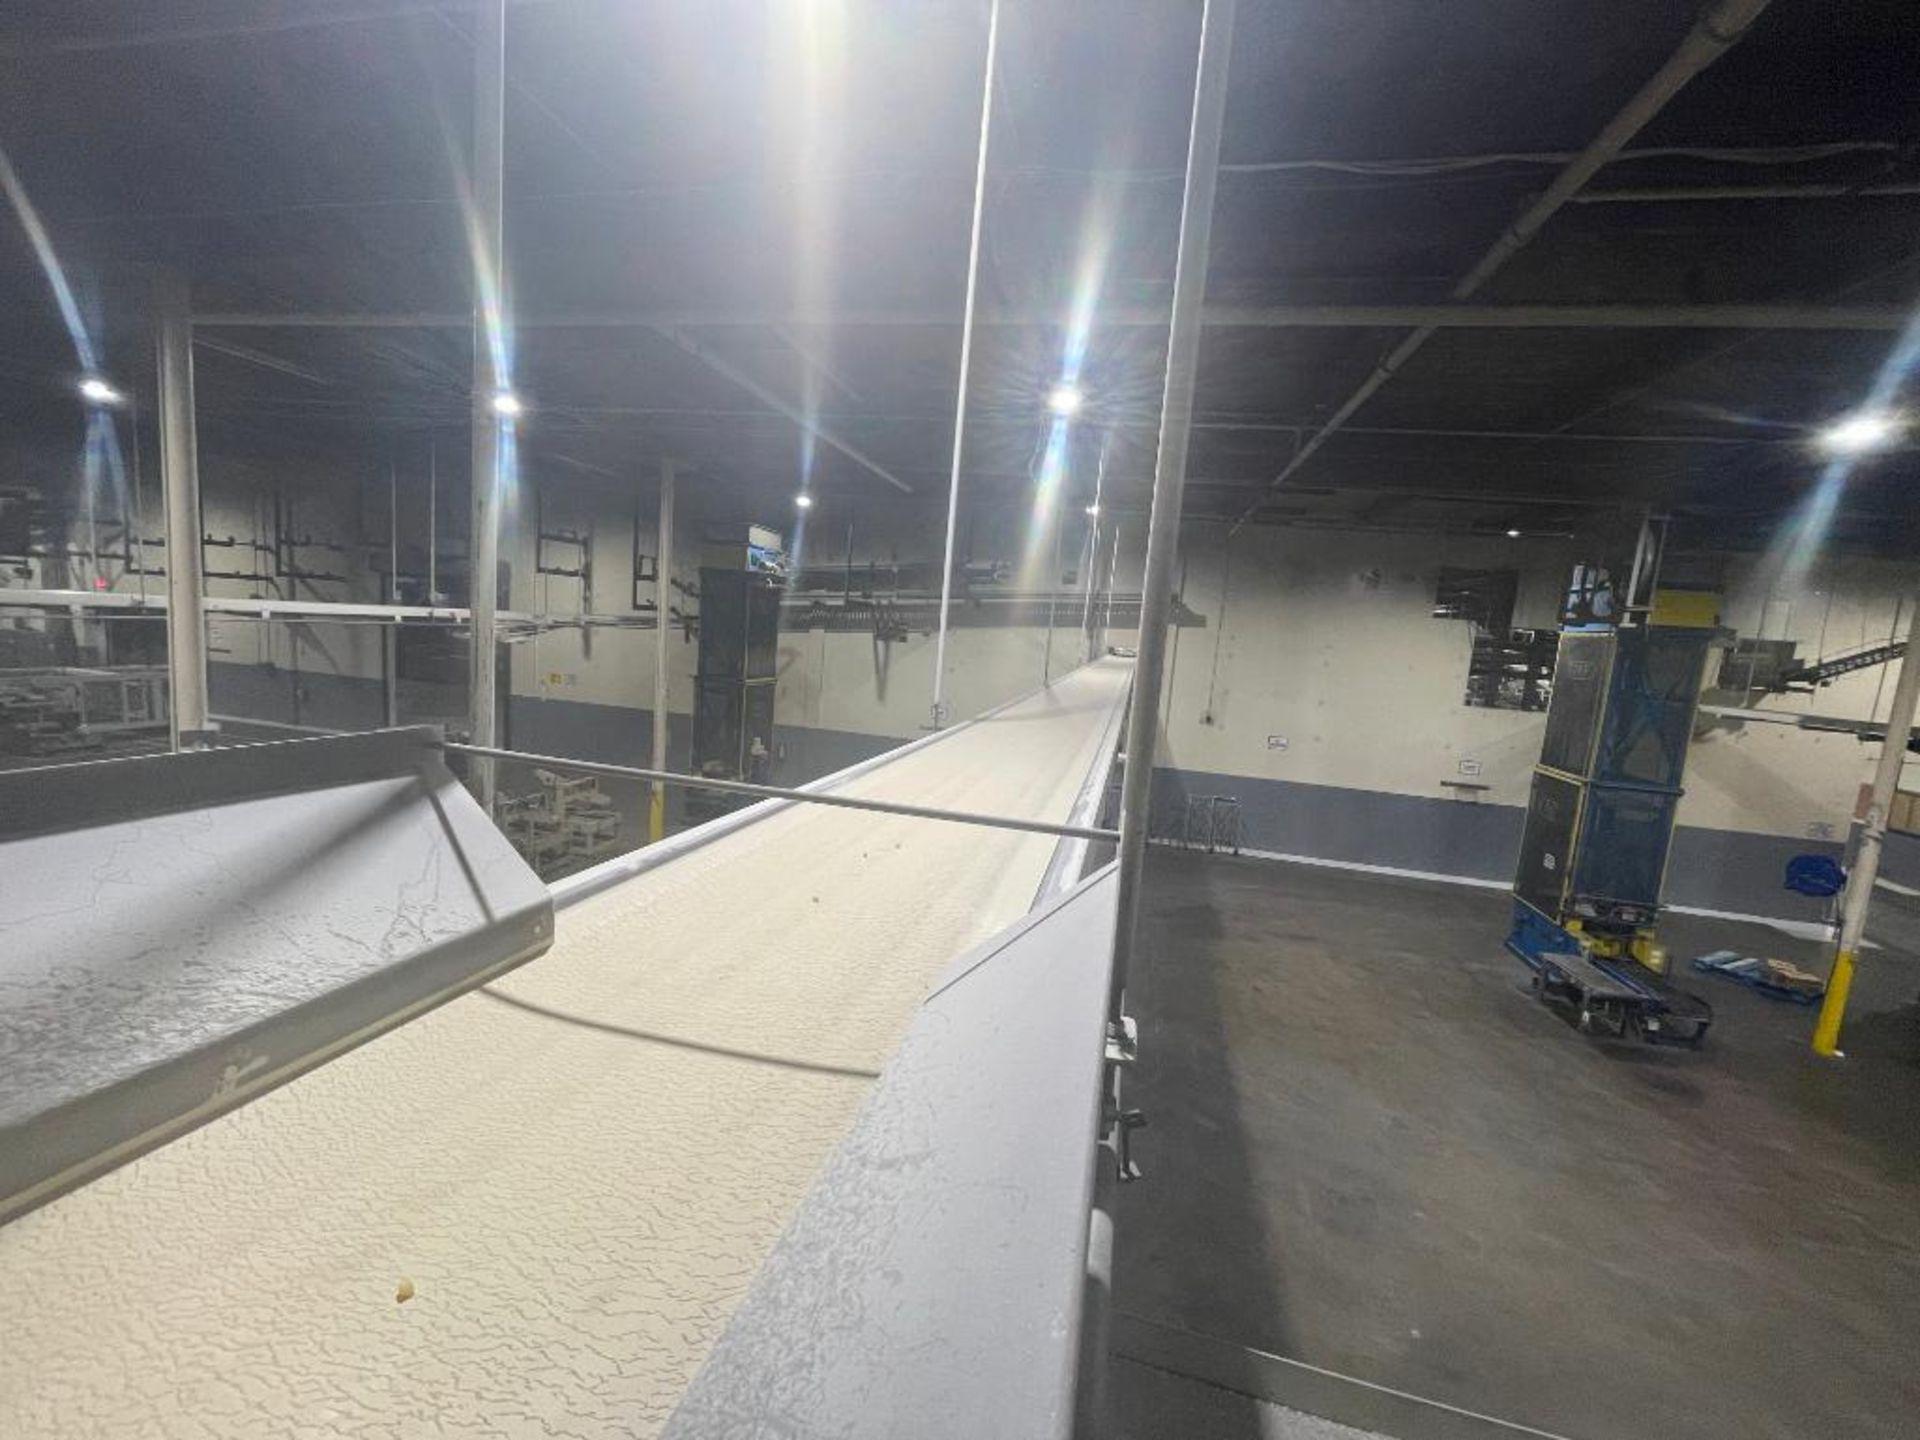 4 Aseeco mild steel conveyors - Image 5 of 14